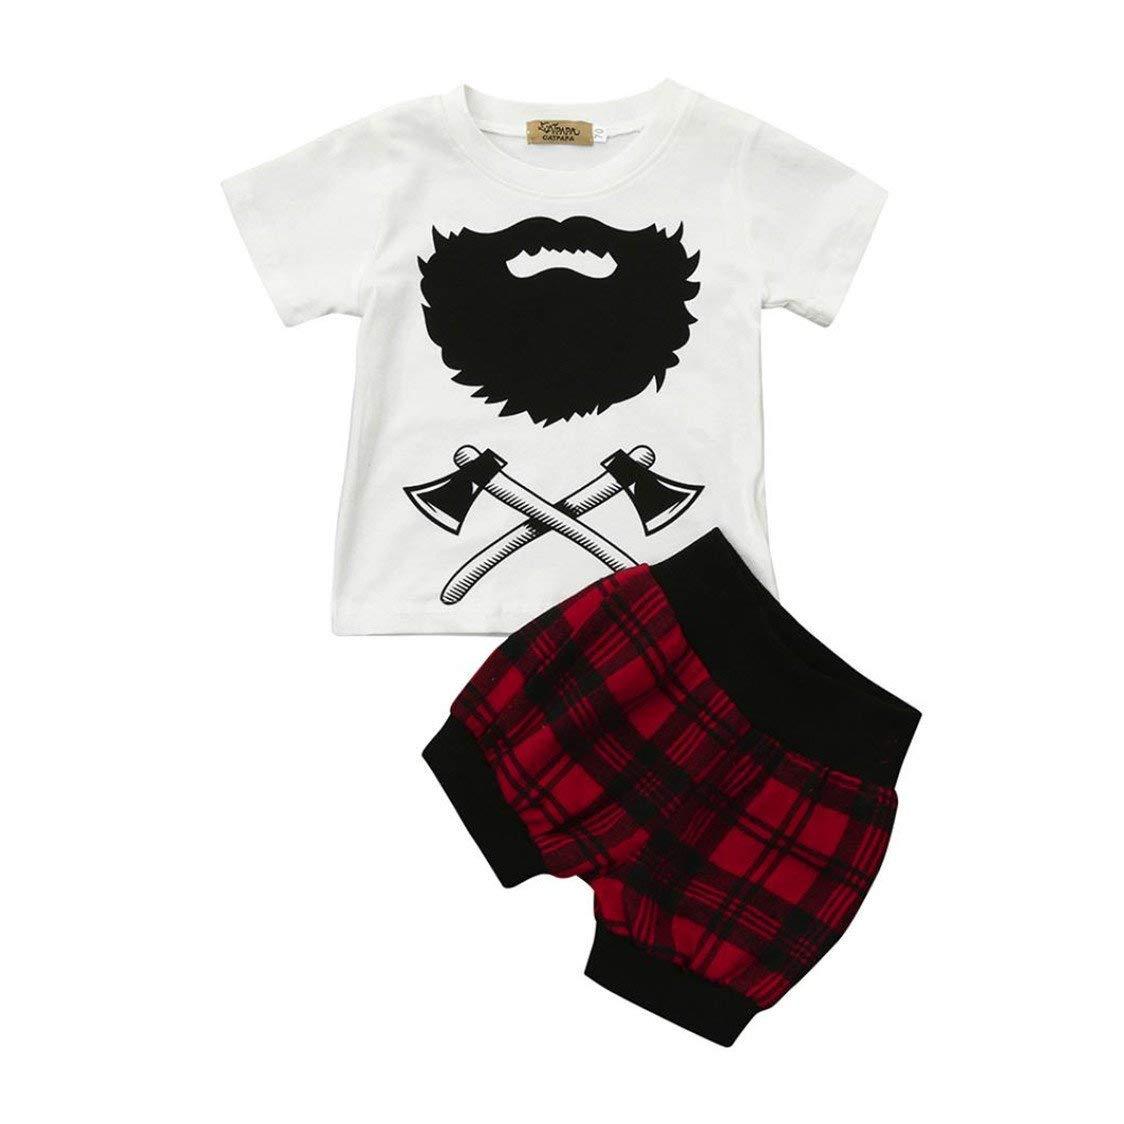 TIFENNY Fashion 2Pcs Infant Baby Boys Girls Clothing Set Cute Plaid T-Shirt Tops+Shorts Clothes Set Outfits For Boys